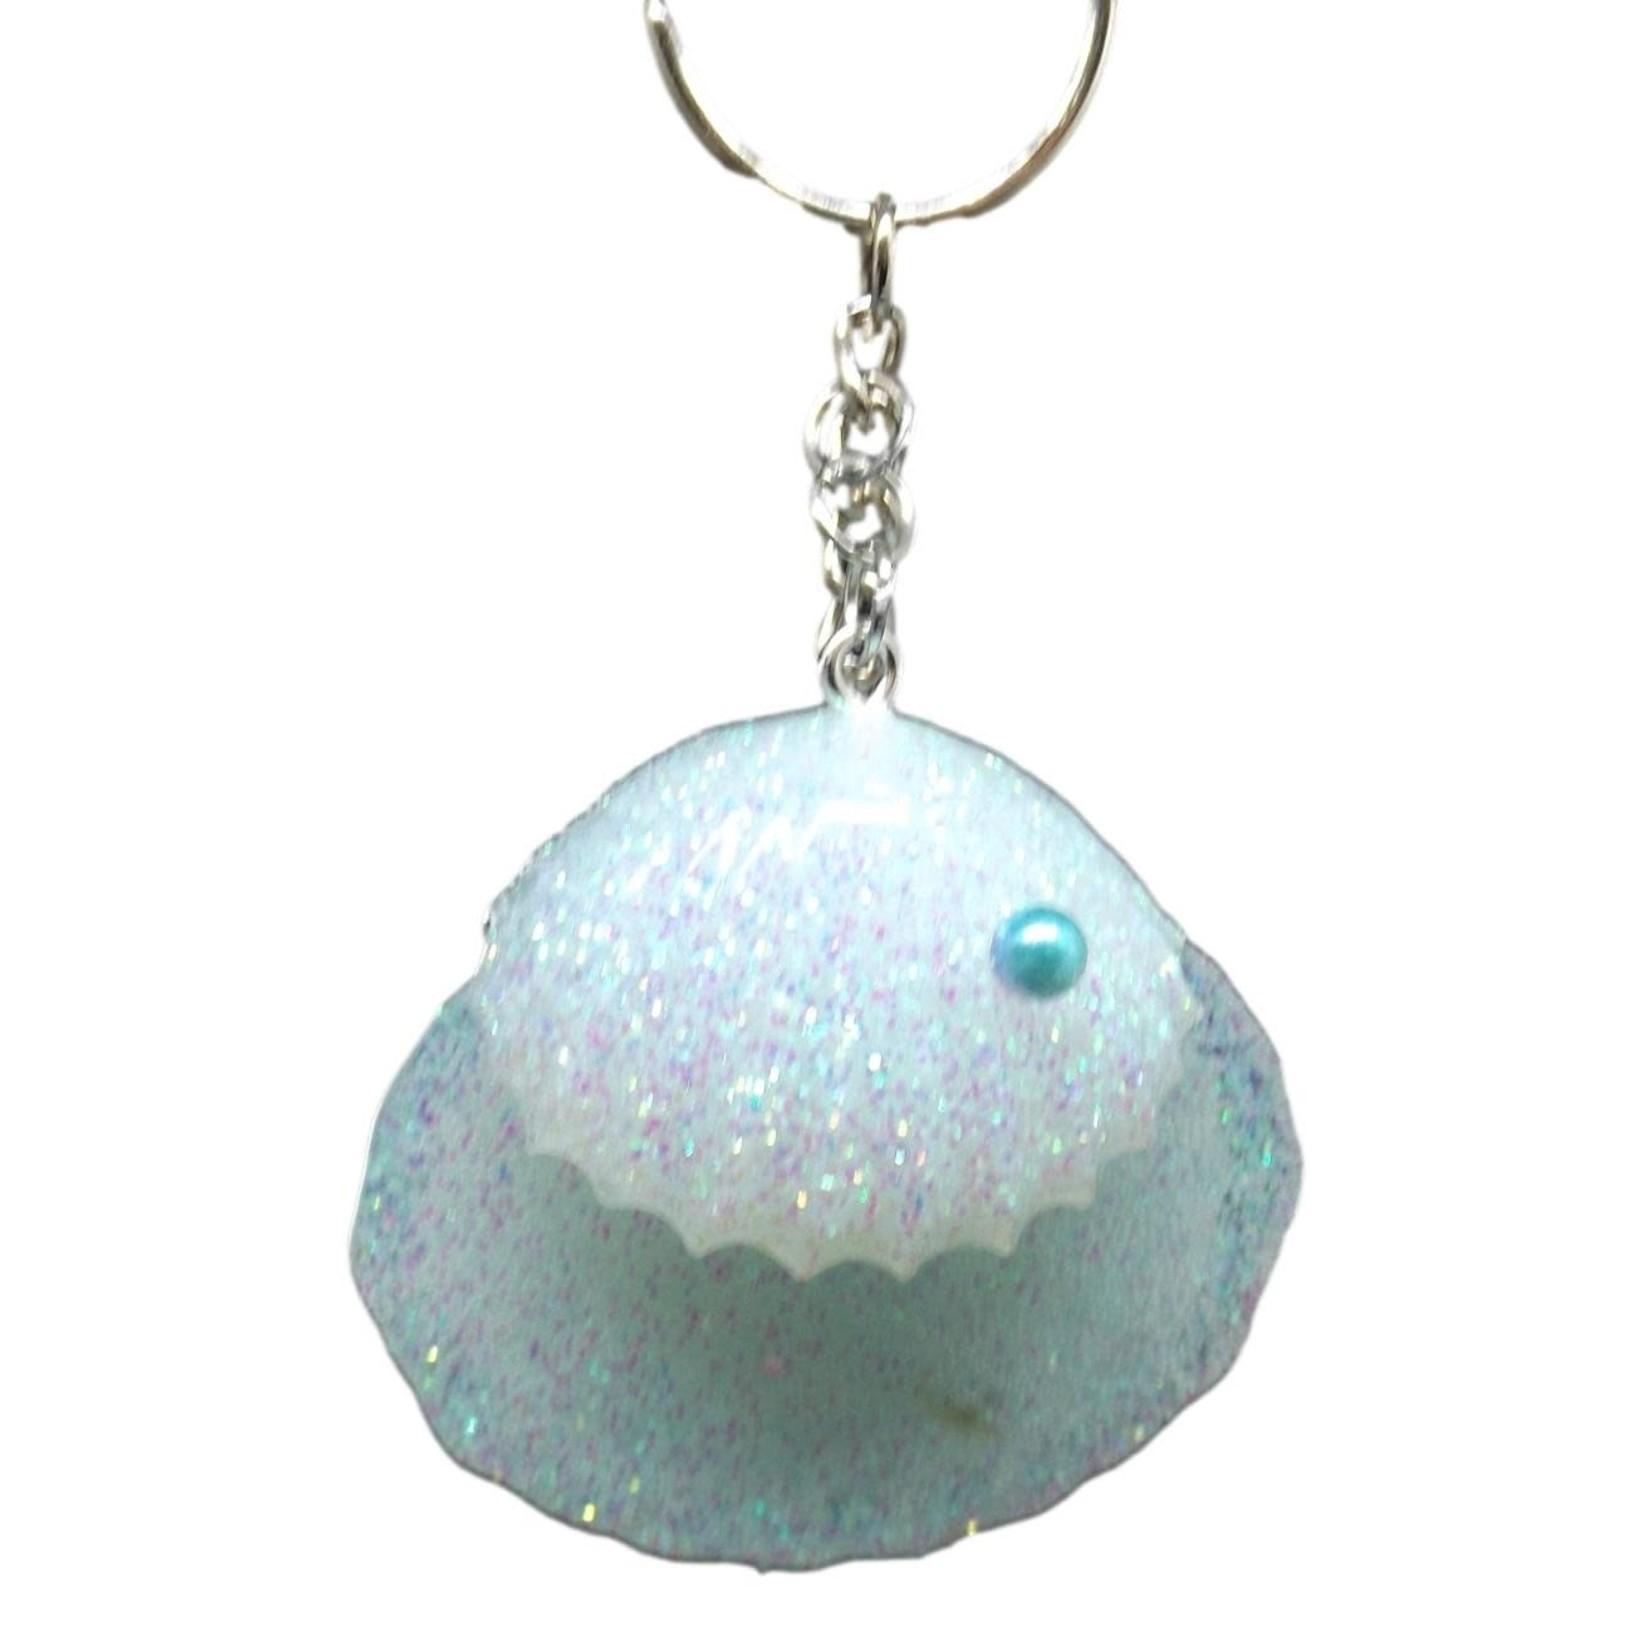 Scallop Shells Keychain